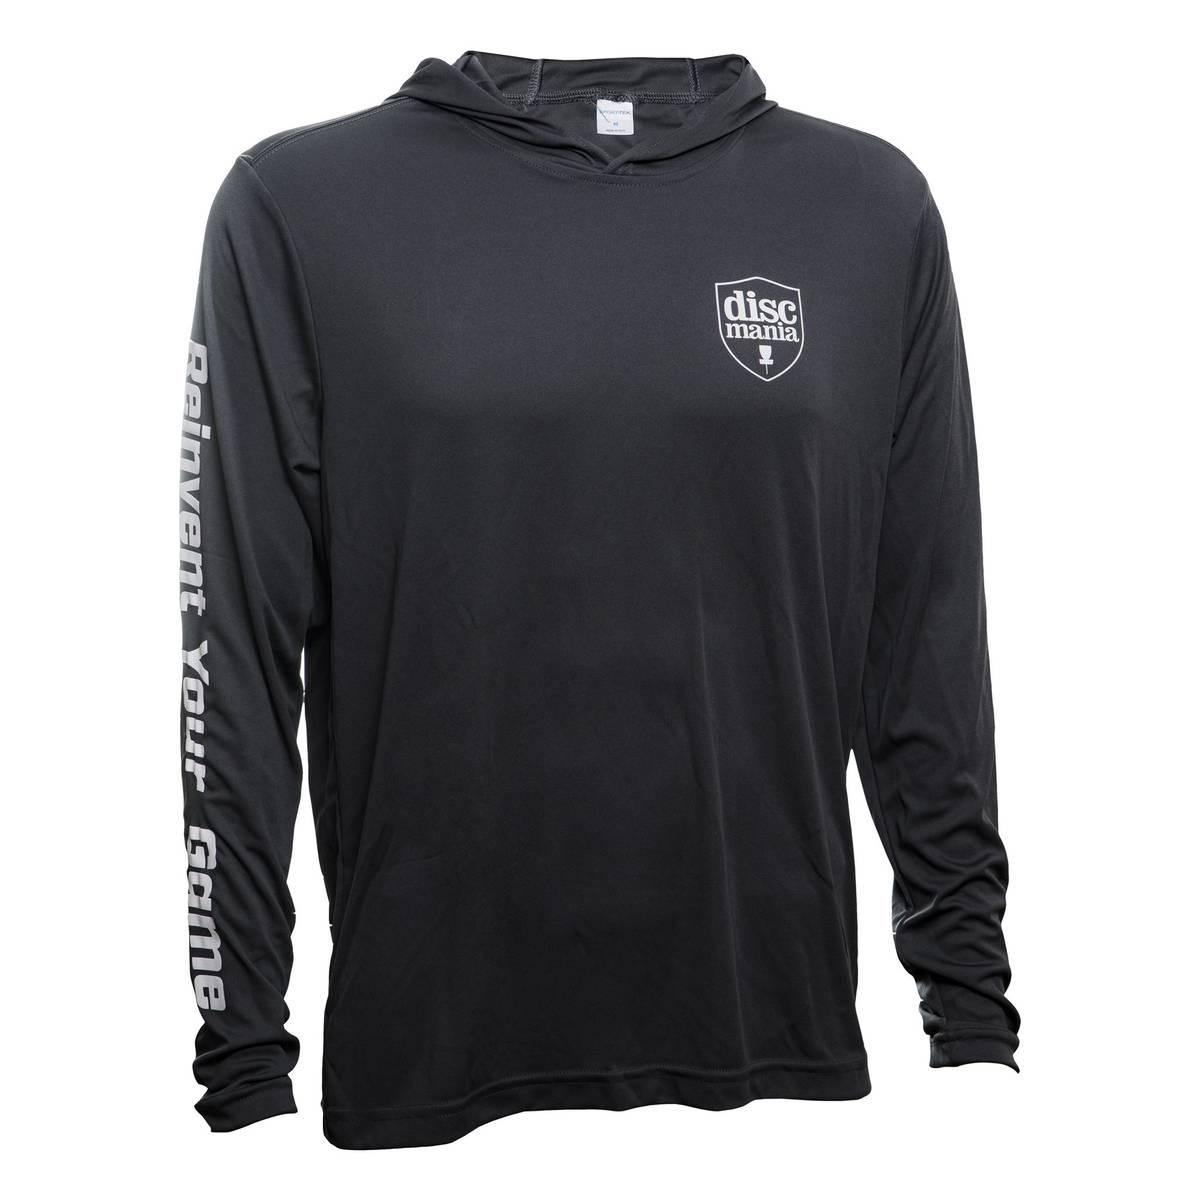 Discmania Performence Long Sleeved Hooded T-shirt